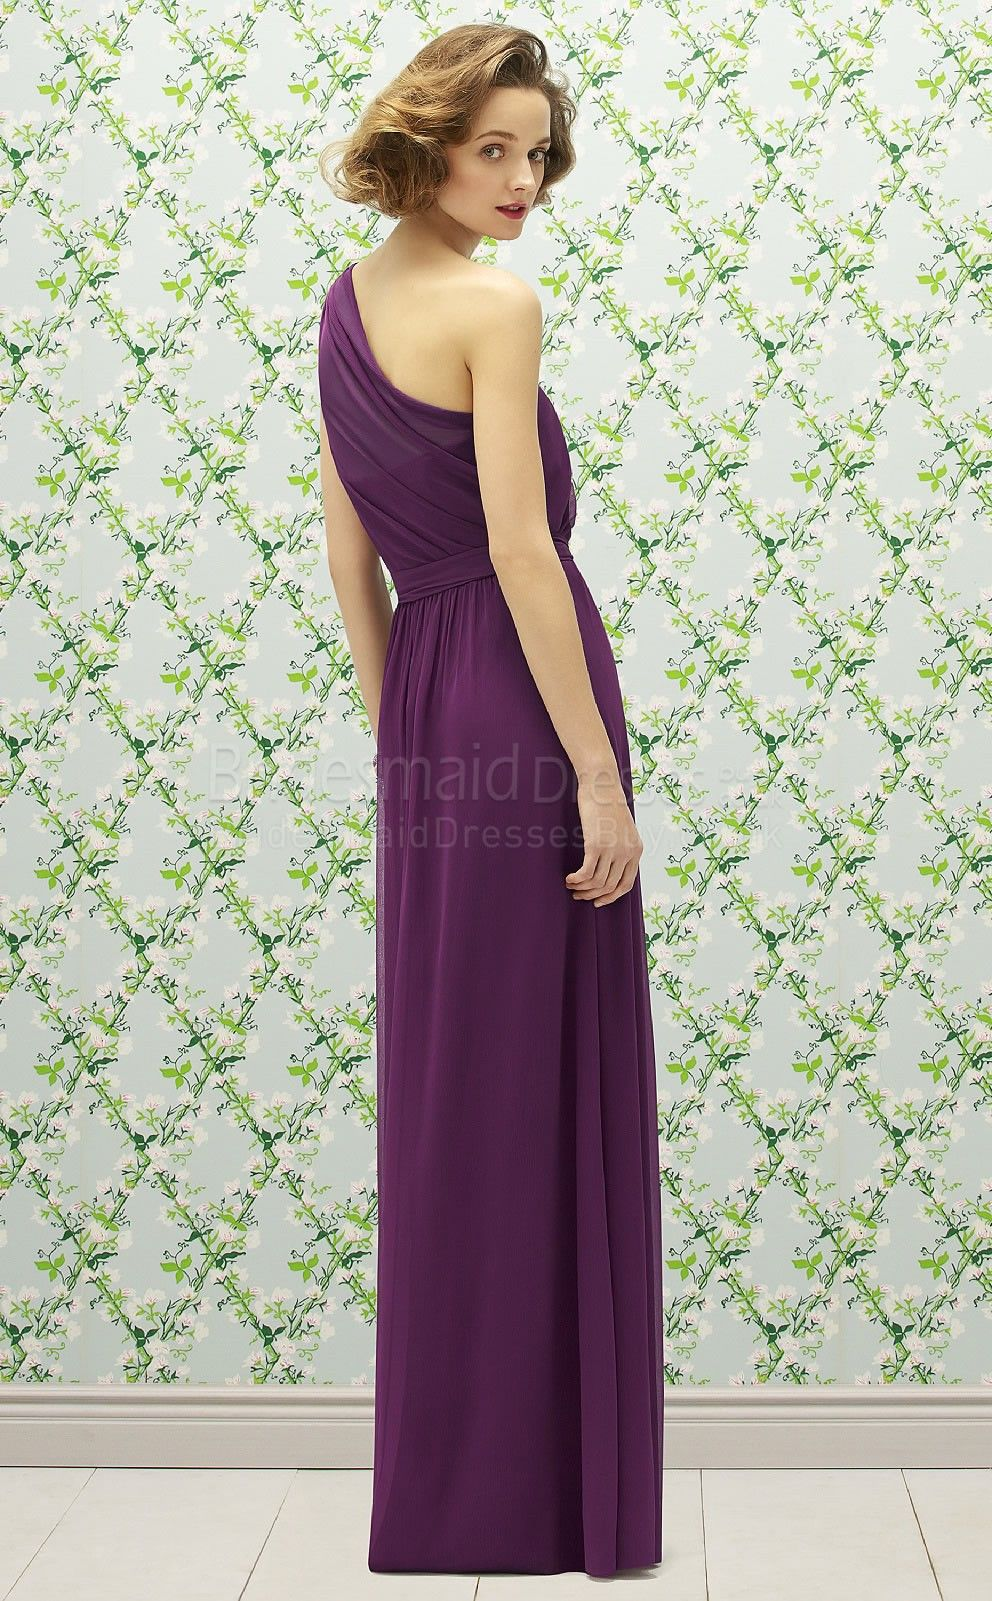 Aline sleeveless one shoulder grape chiffon floorlength purple